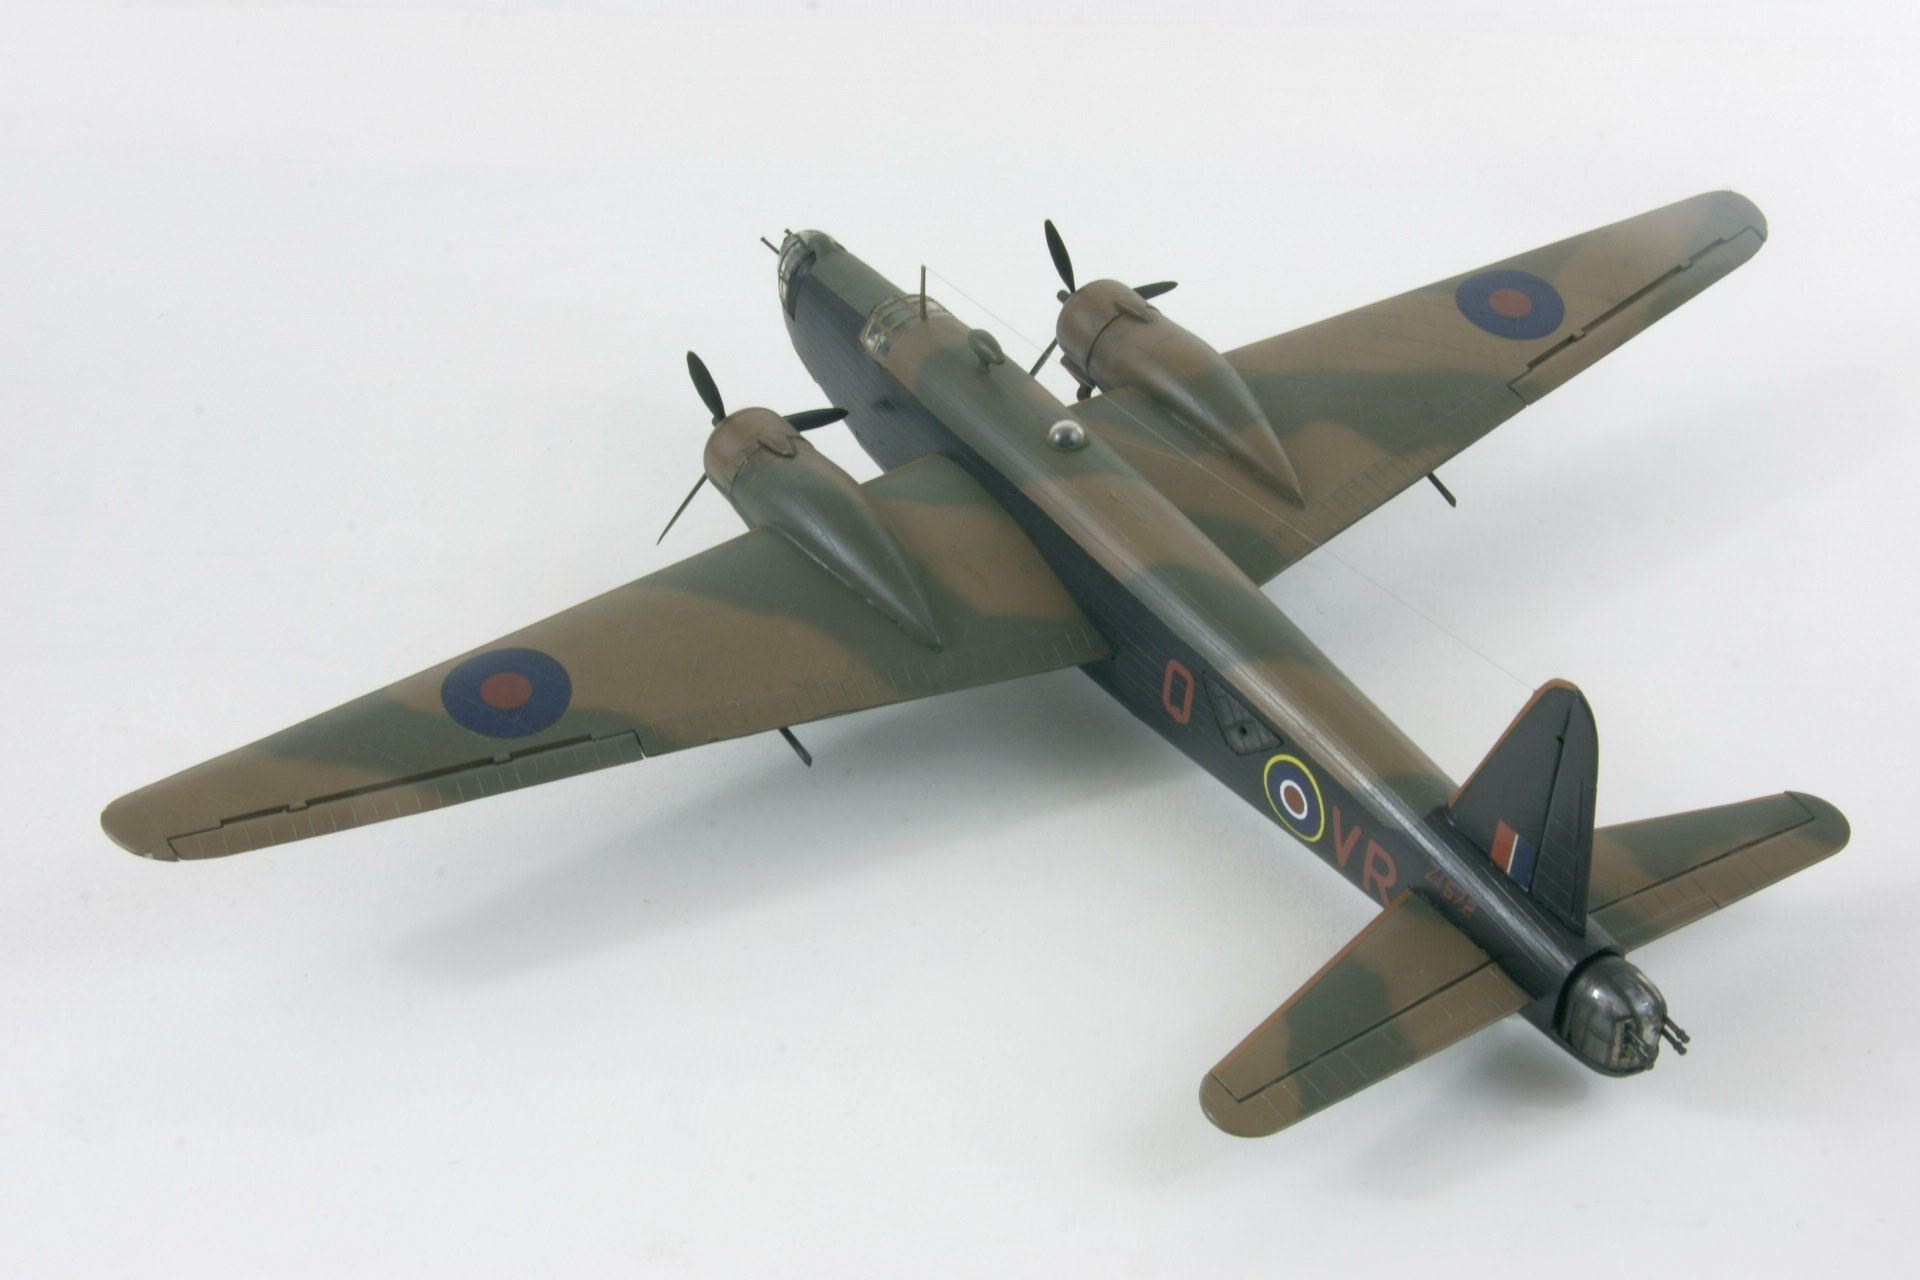 Vickers wellington biii 2 1